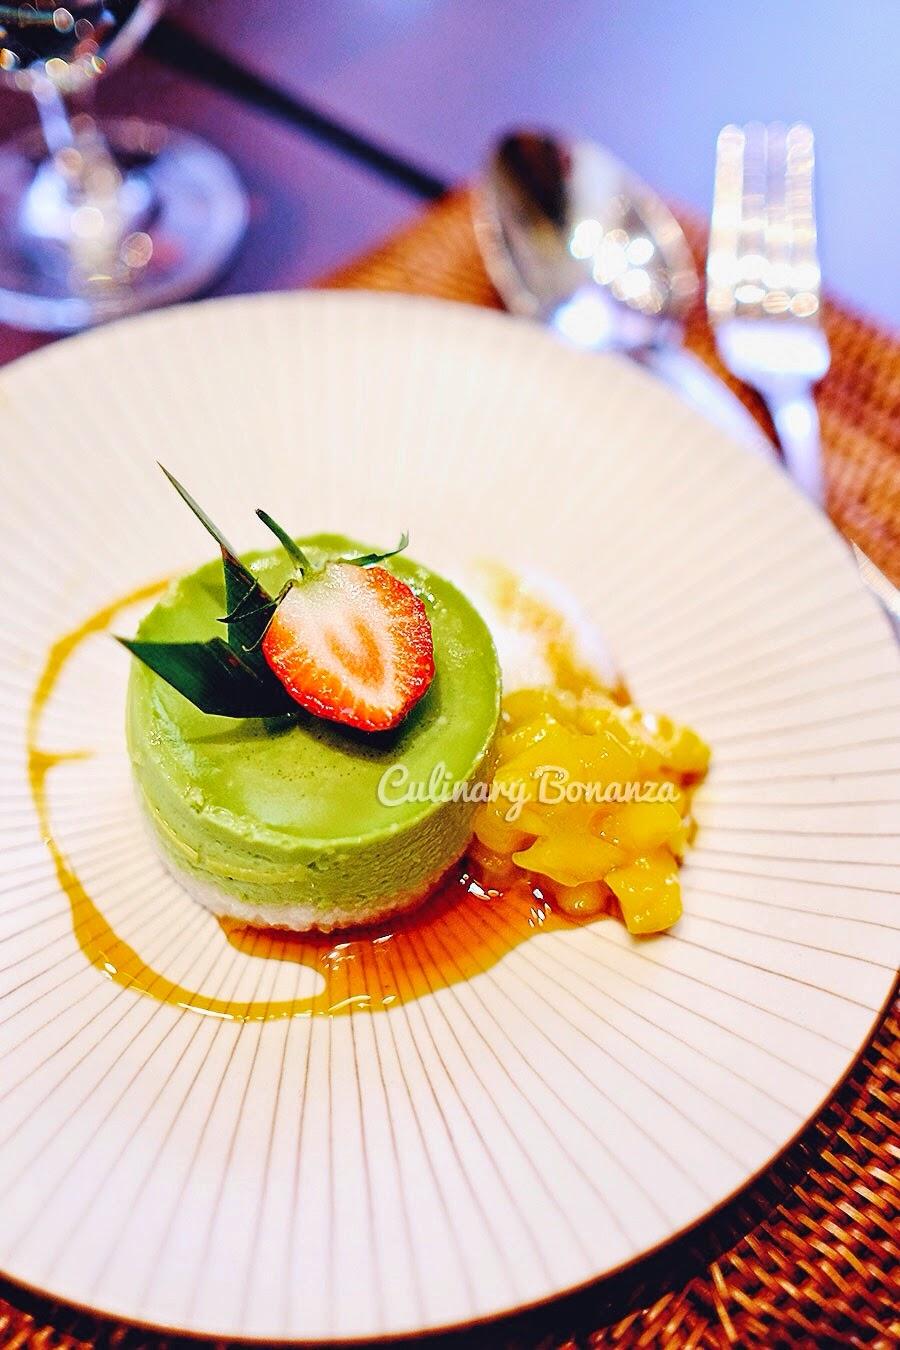 Pandan Srikaya at Jakarta Restaurant, The Dharmawangsa (www.culinarybonanza.com)